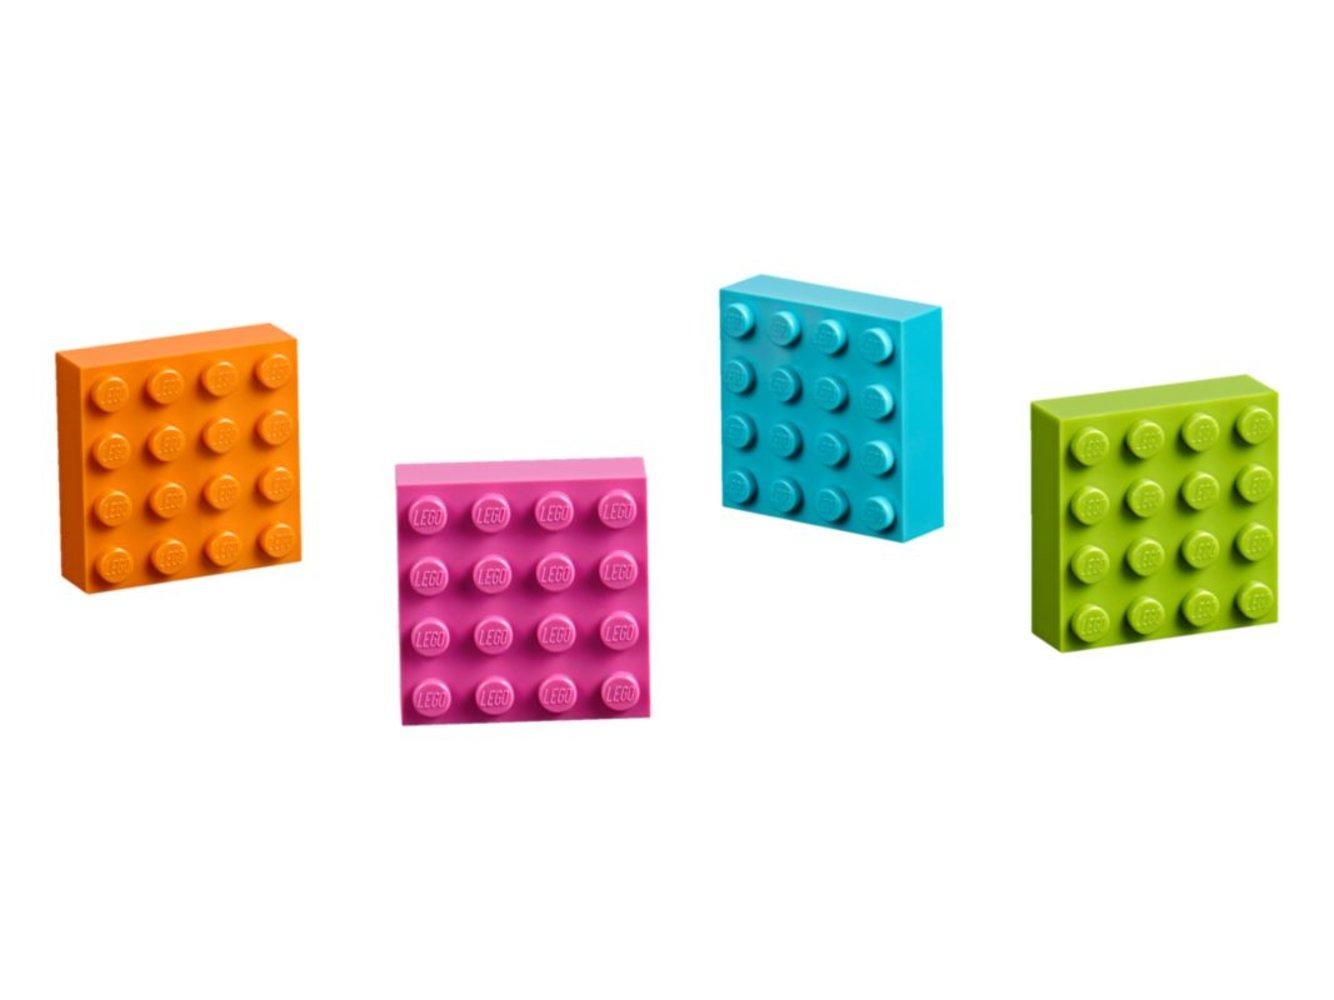 4x4 Brick Magnets